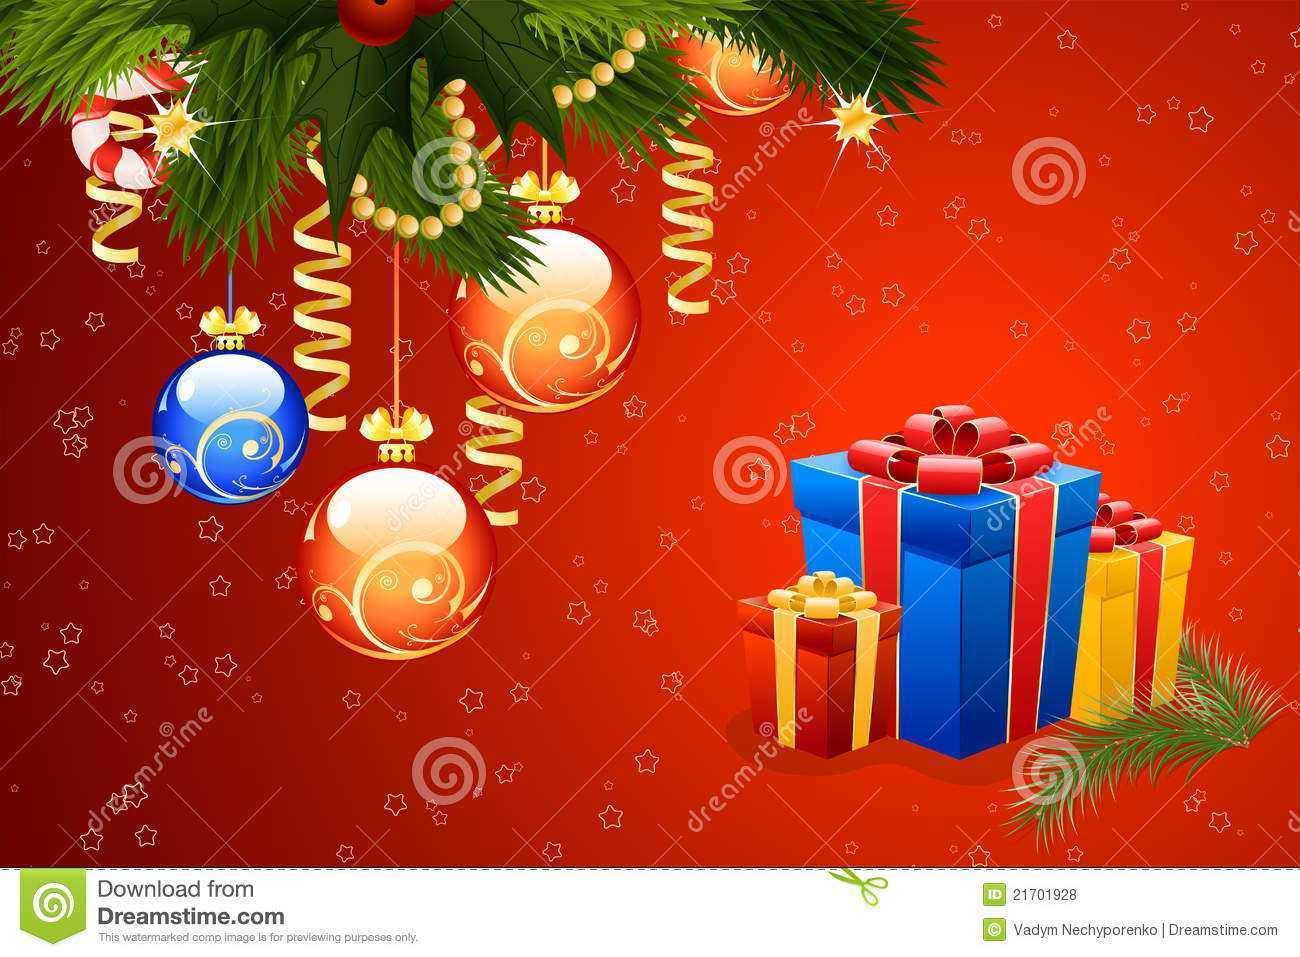 34 Format Christmas Card Template Illustrator Free Photo with Christmas Card Template Illustrator Free